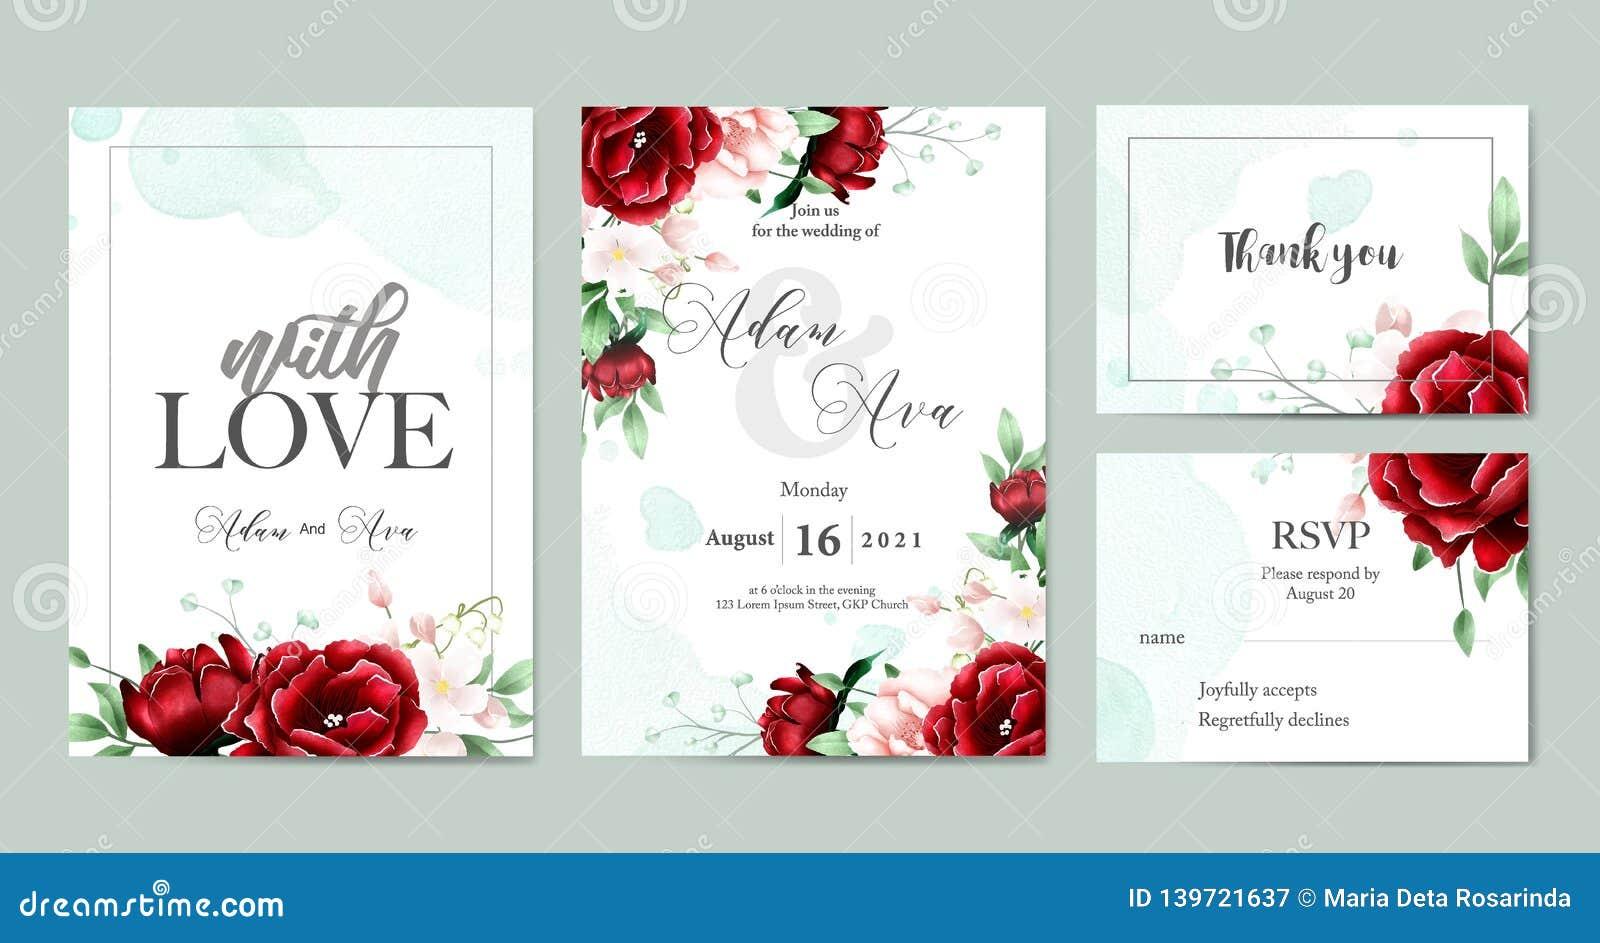 Floral Watercolor Wedding Invitation Template Set Stock Vector -  Illustration of creative, invitation: 139721637